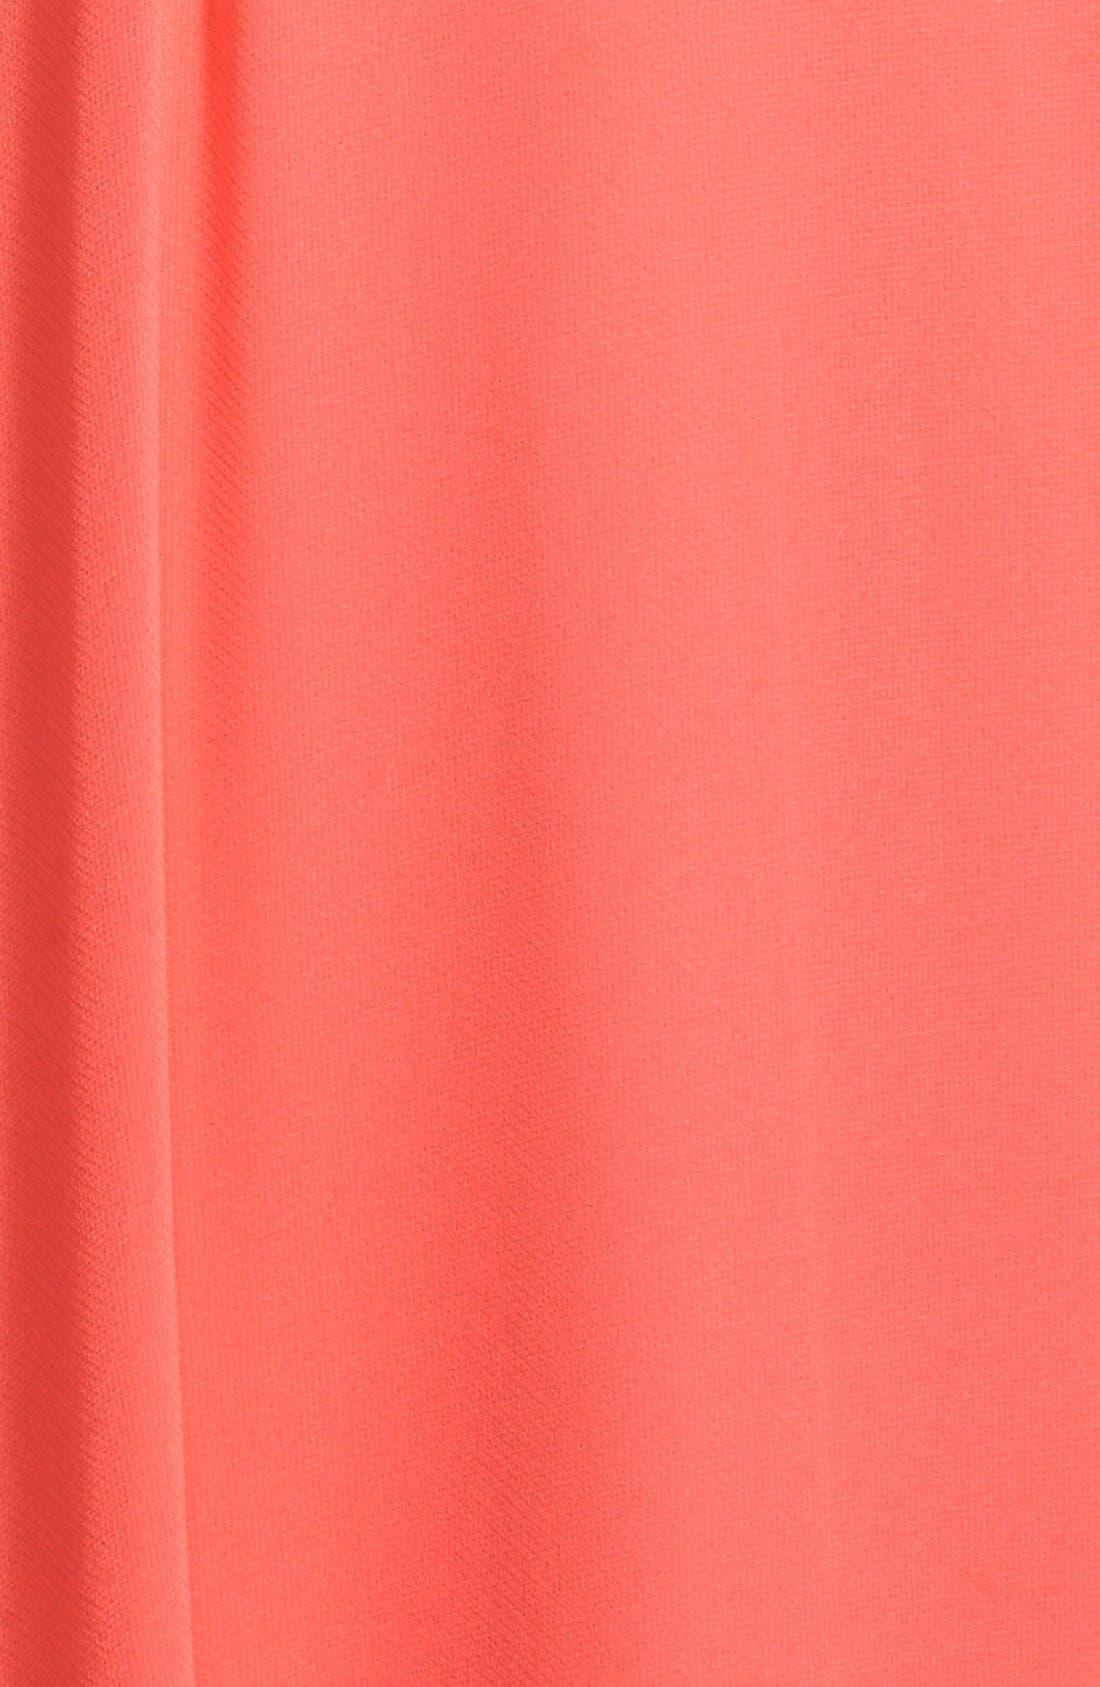 Alternate Image 3  - BCBGMAXAZRIA 'Daniele' Embellished One-Shoulder Georgette Gown